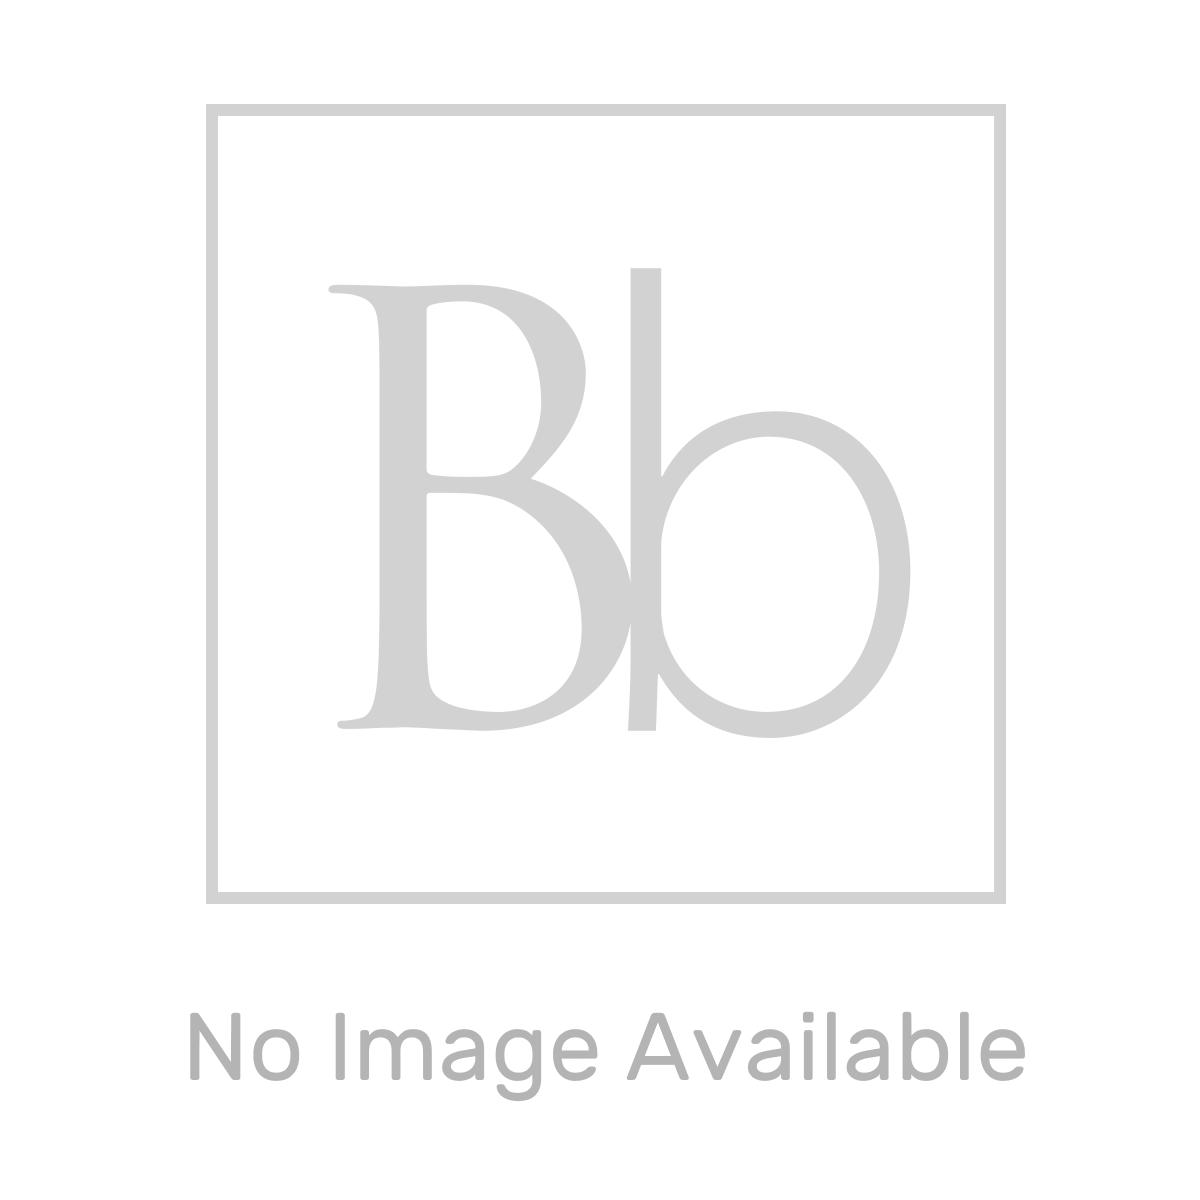 RAK Series 600 Bathroom Suite with Sliding Shower Enclosure Drawing